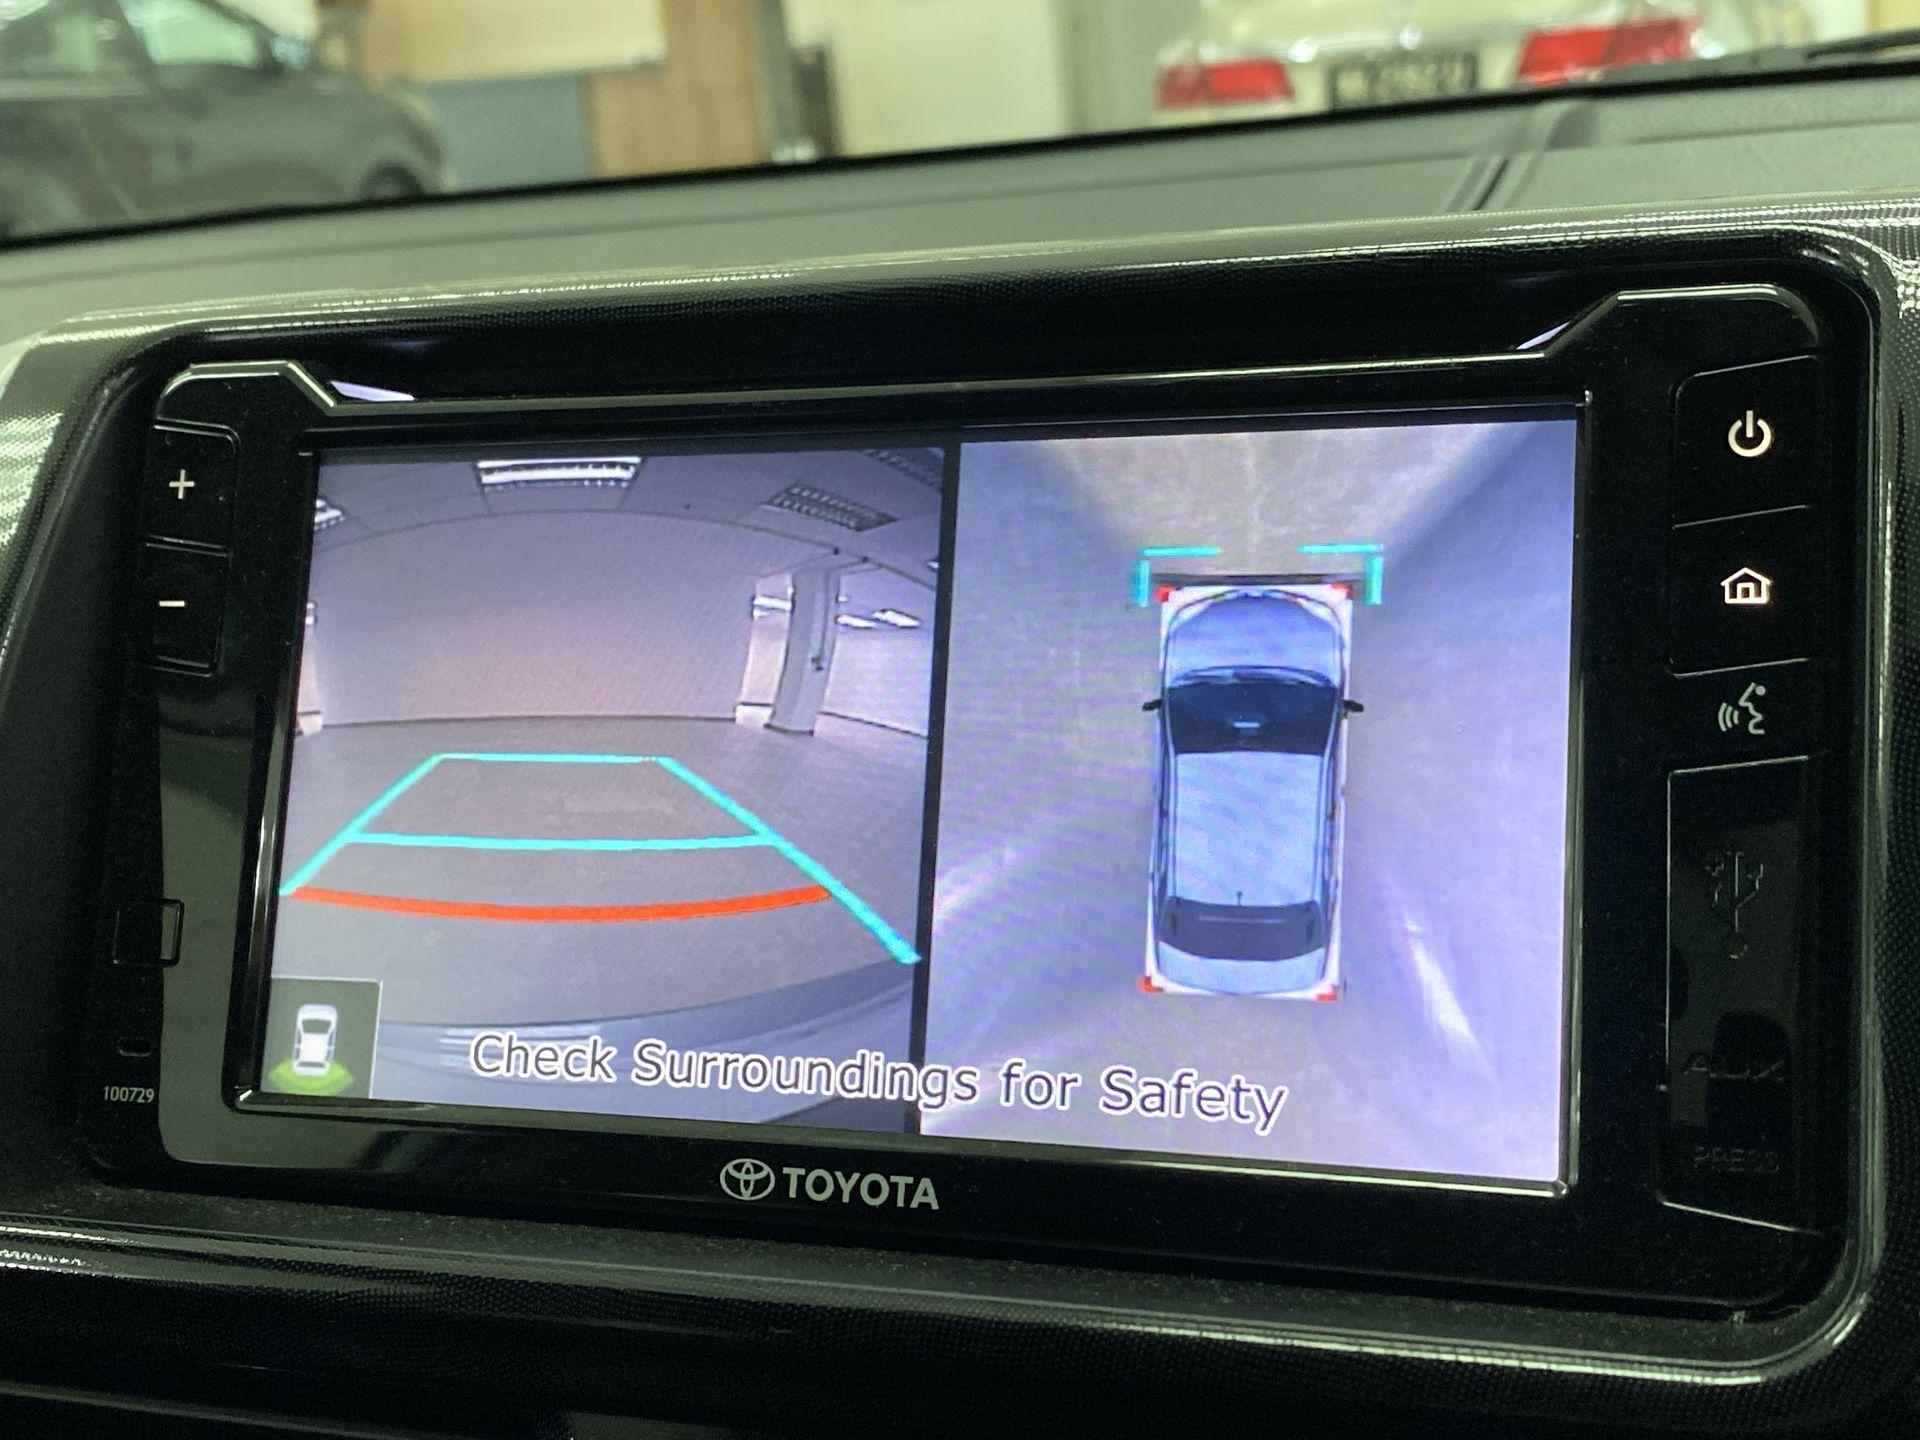 2017 Toyota Vios 1.5G (AT)